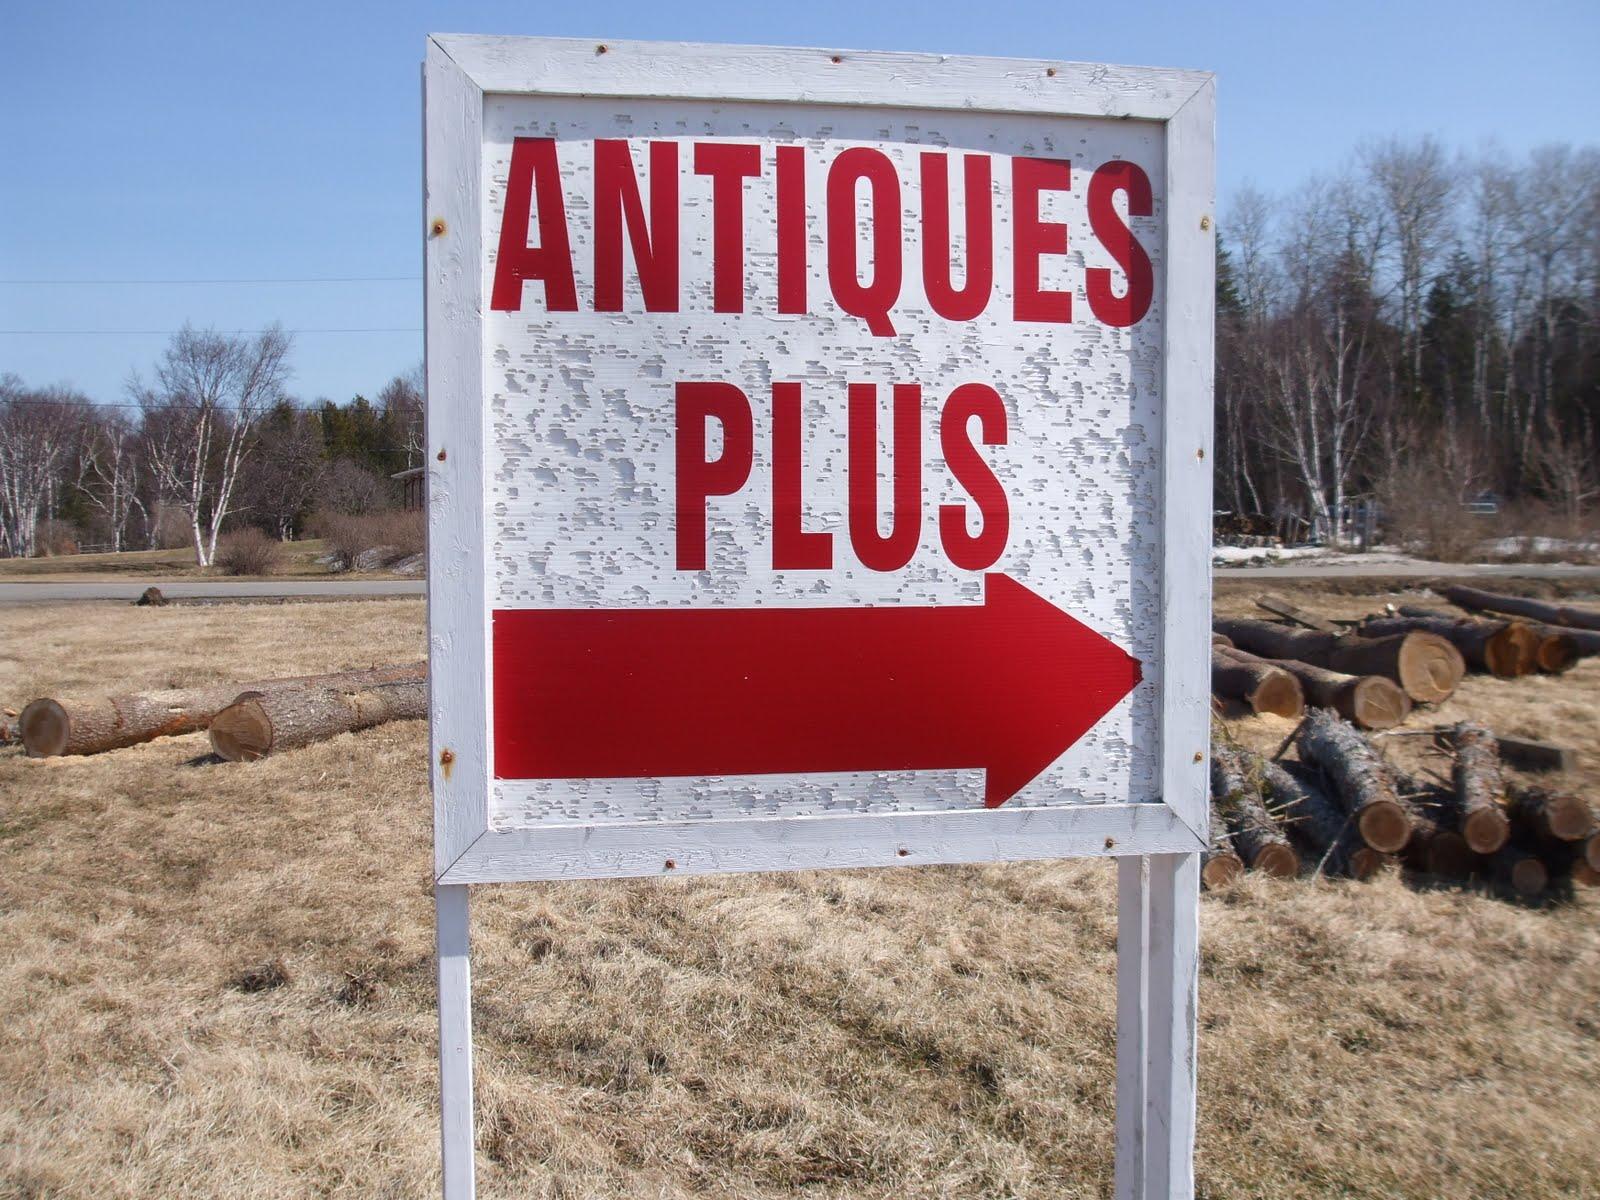 3.bp.blogspot.com__-dvsPmEluA0_S7e1MEQB_8I_AAAAAAAAAhk_BbFrdgDMvmM_s1600_antiques+plus